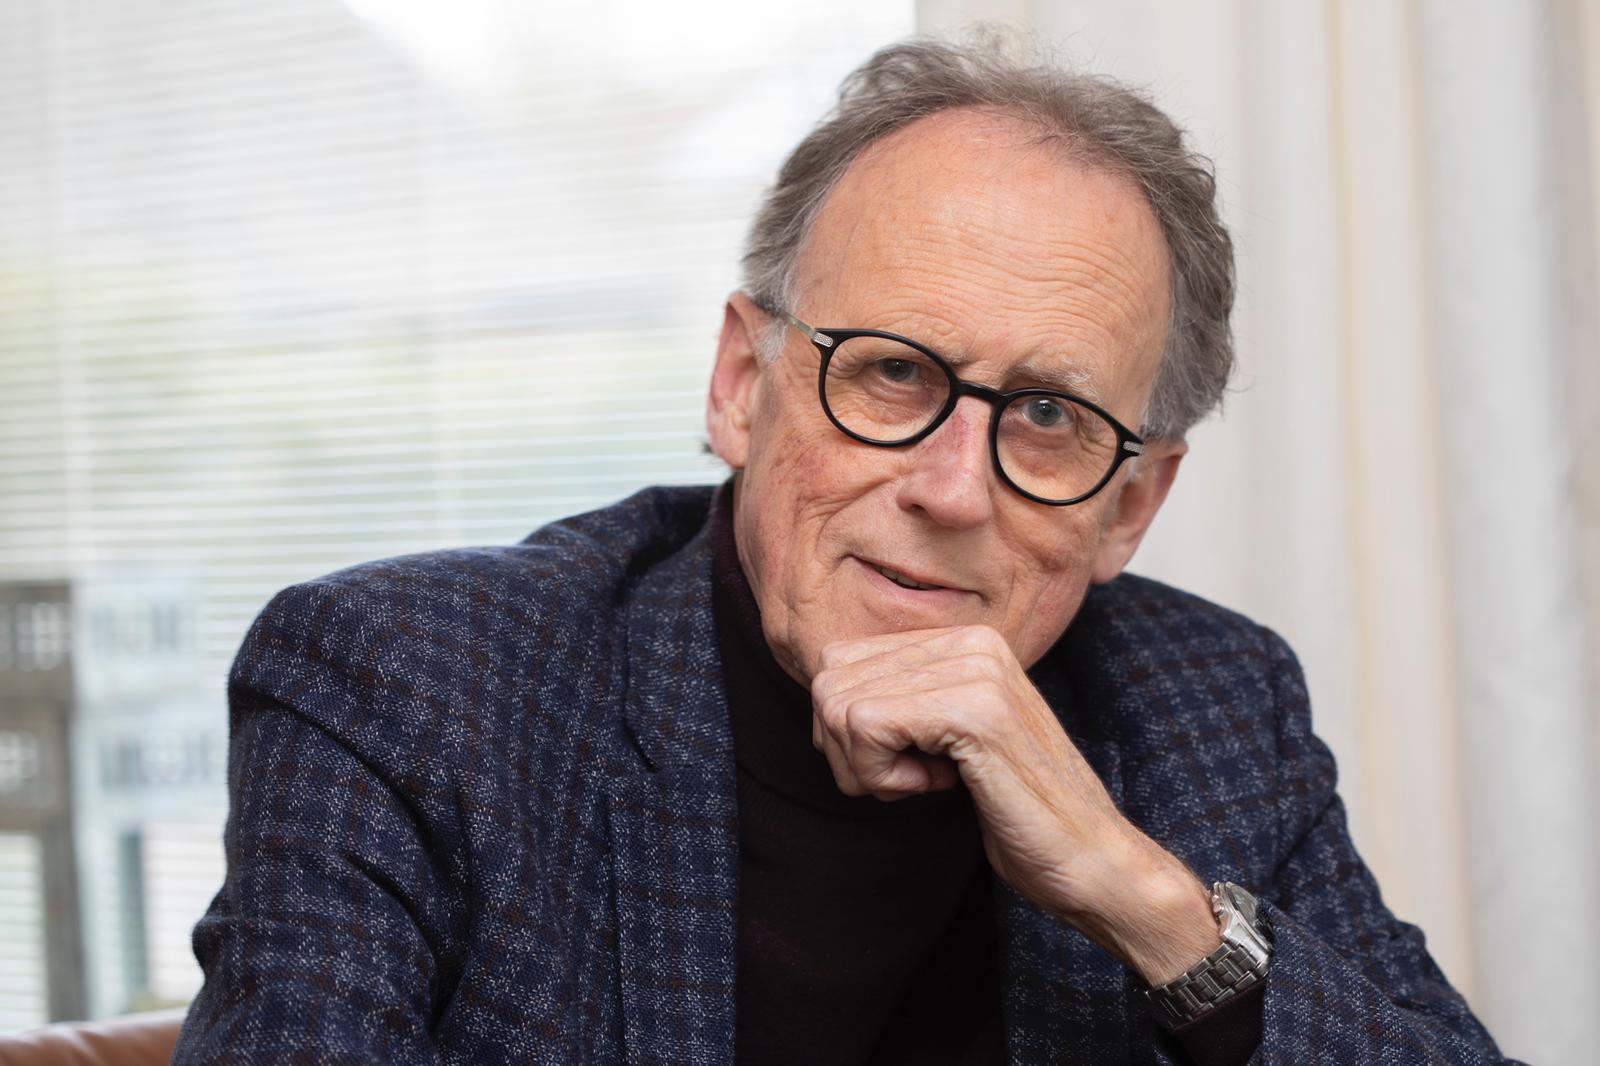 Gerard de Lange